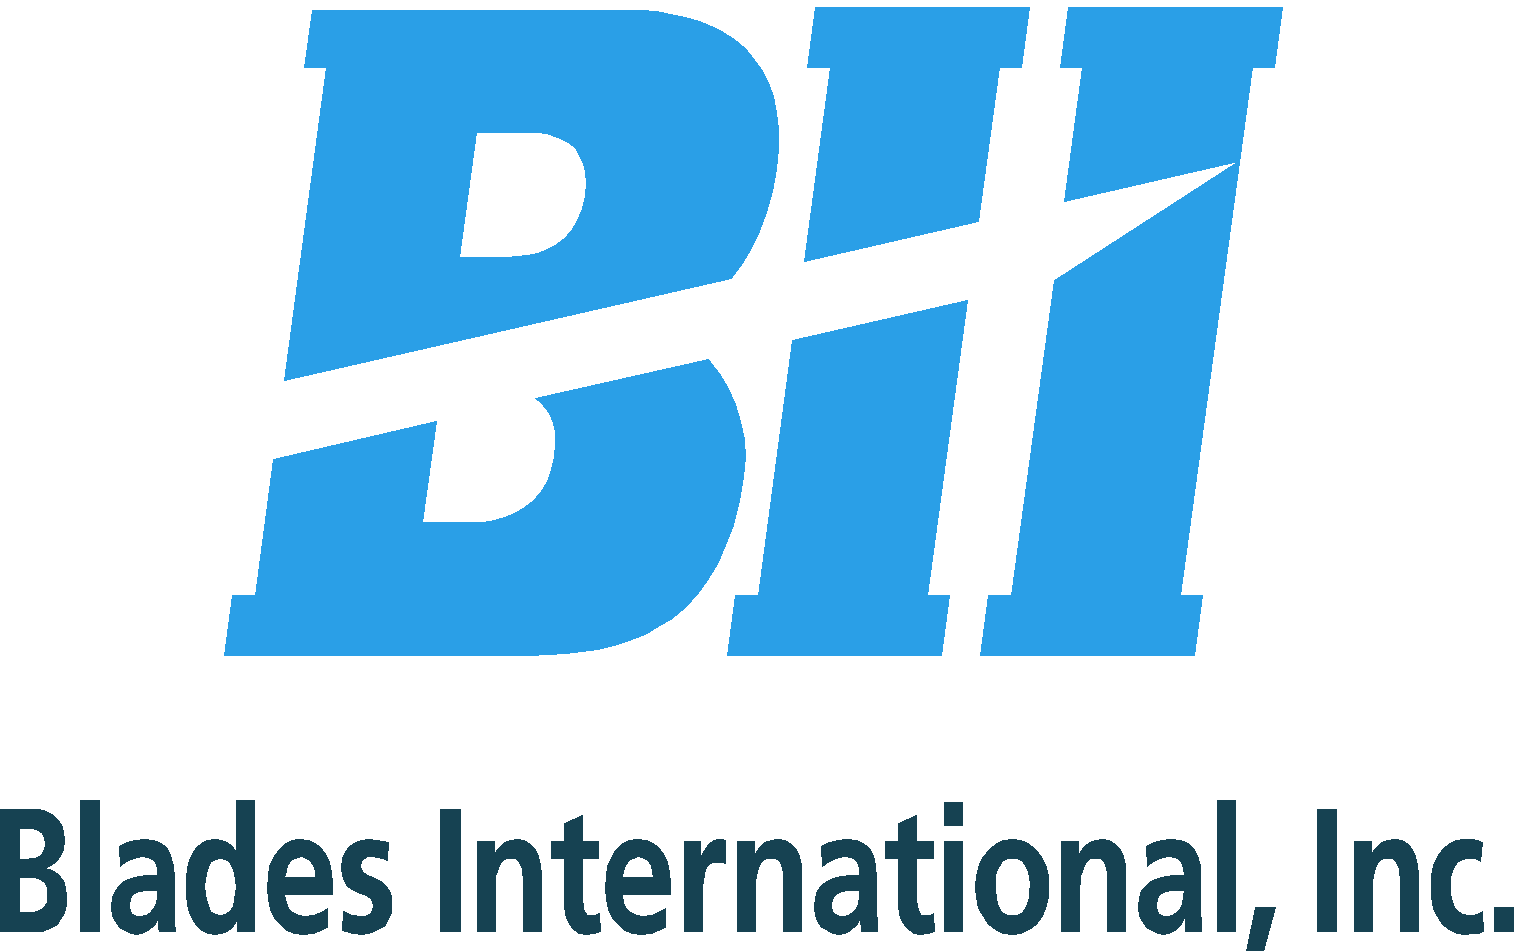 Blades International, Inc